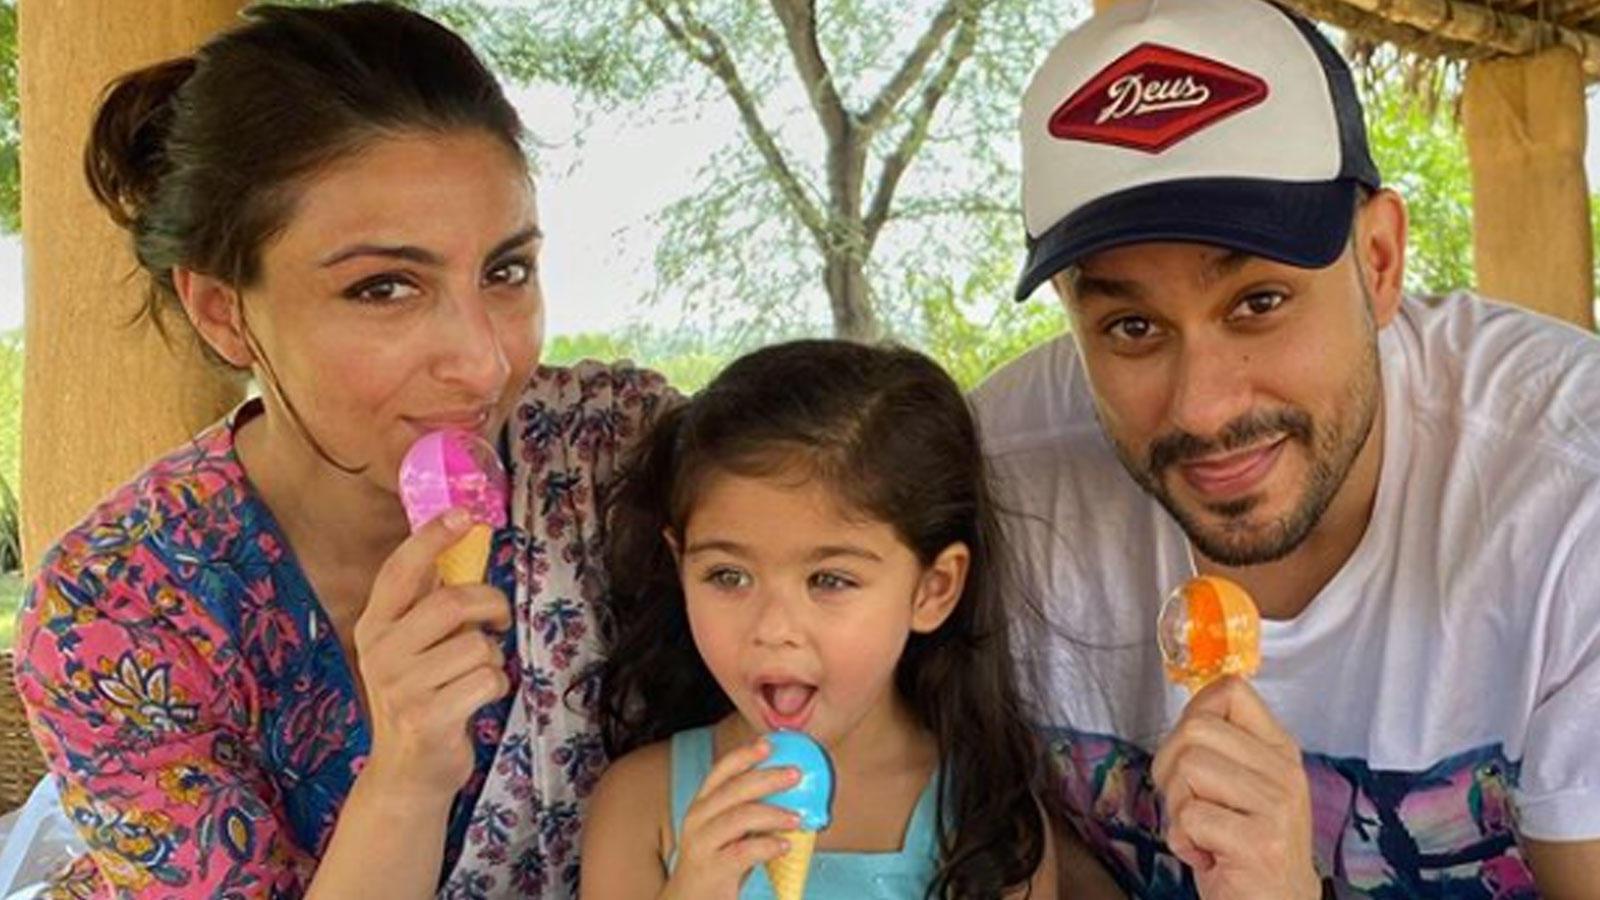 inaaya-naumi-kemmu-turns-three-mom-soha-ali-khan-wishes-her-with-an-adorable-post